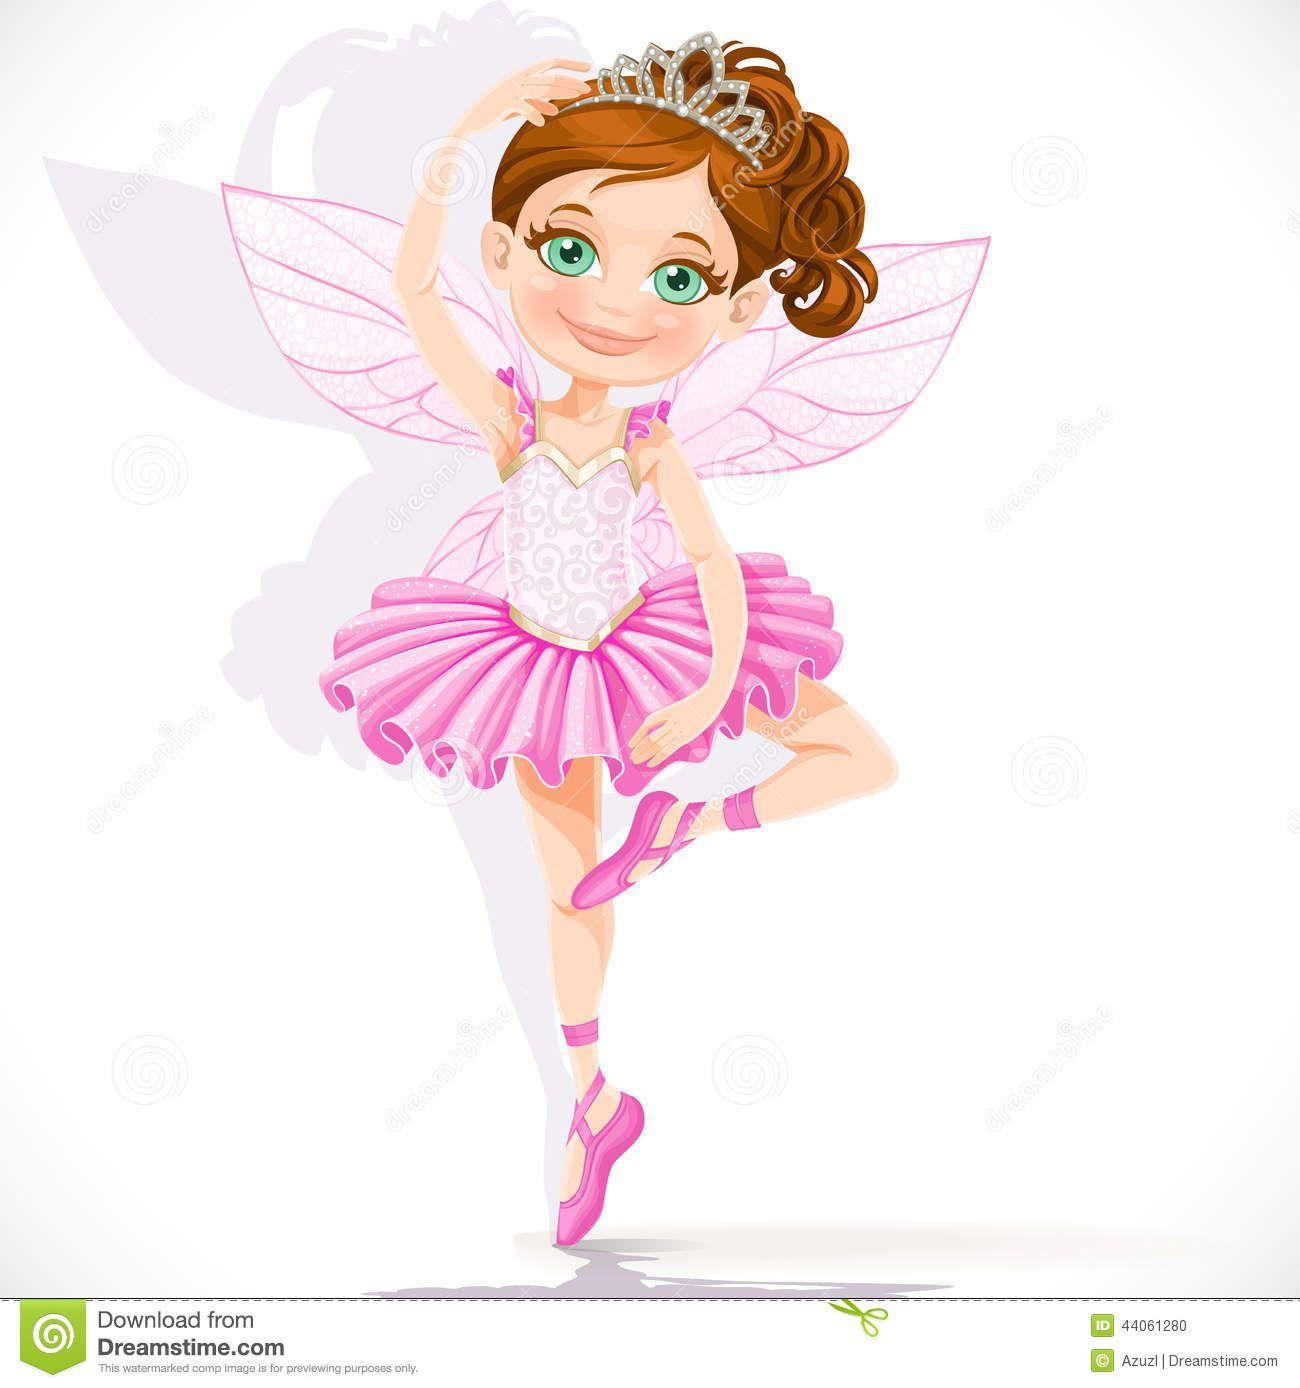 Girls Angels clipart.